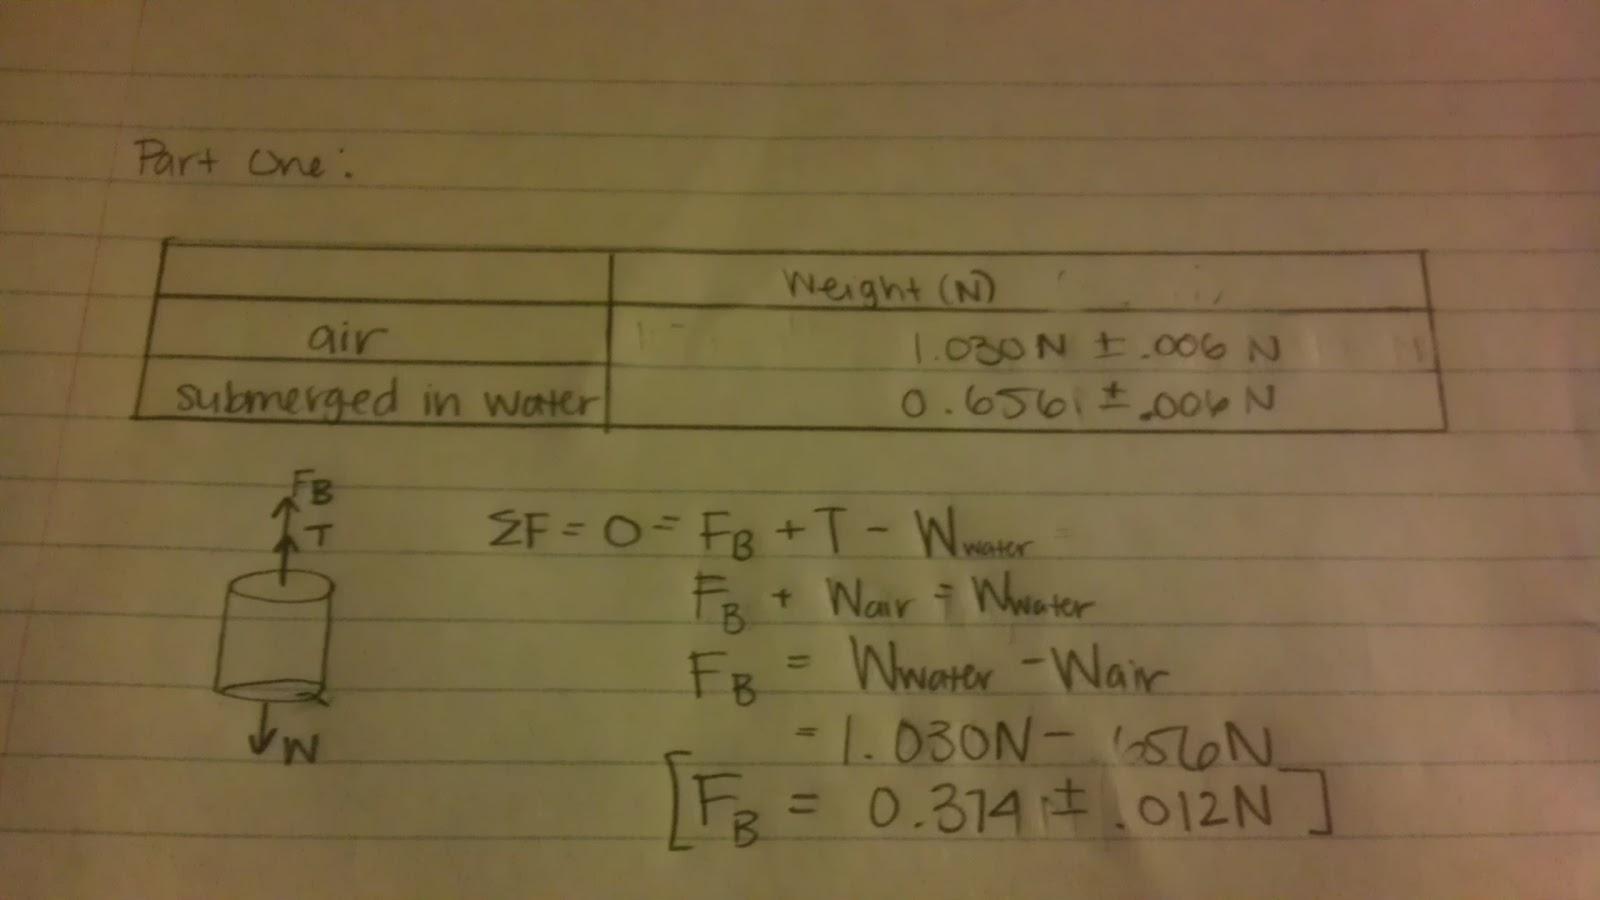 physics 4c mtostado experiment 1 fluid statics rh physics4cmtostado blogspot com Free Body Diagram Beam Free Body Diagram Kinetic